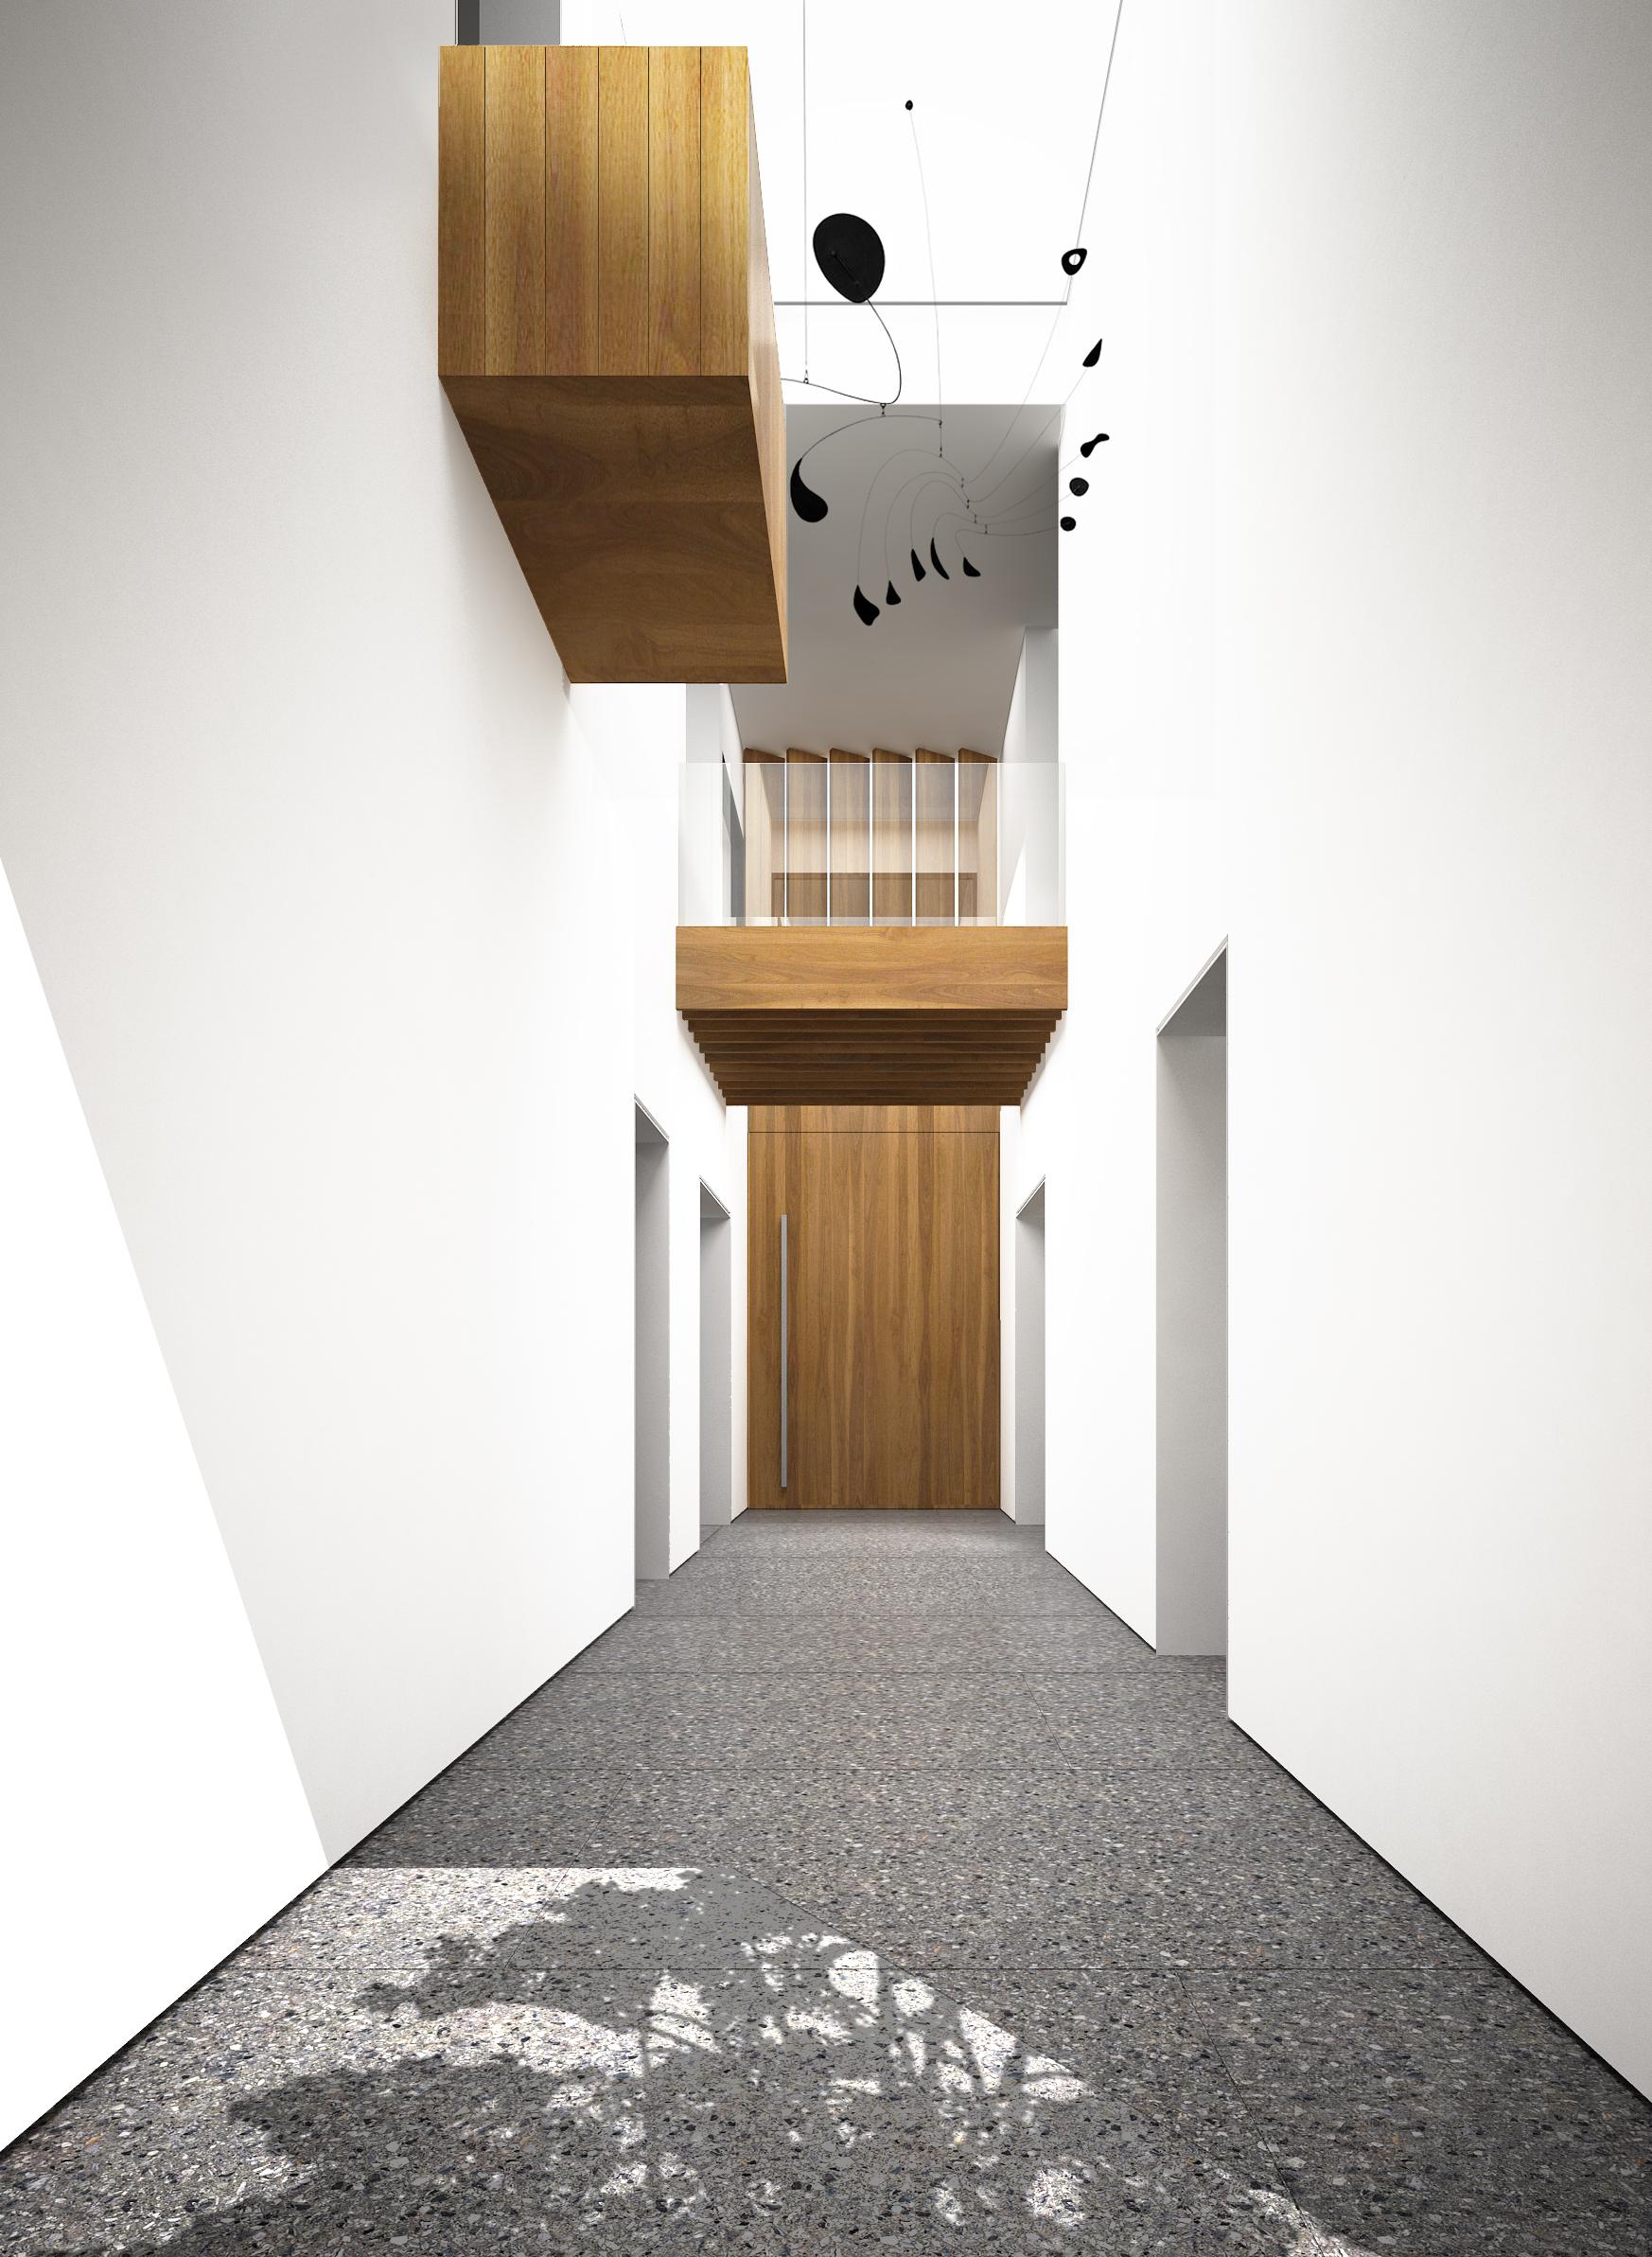 02 Foyer gallery